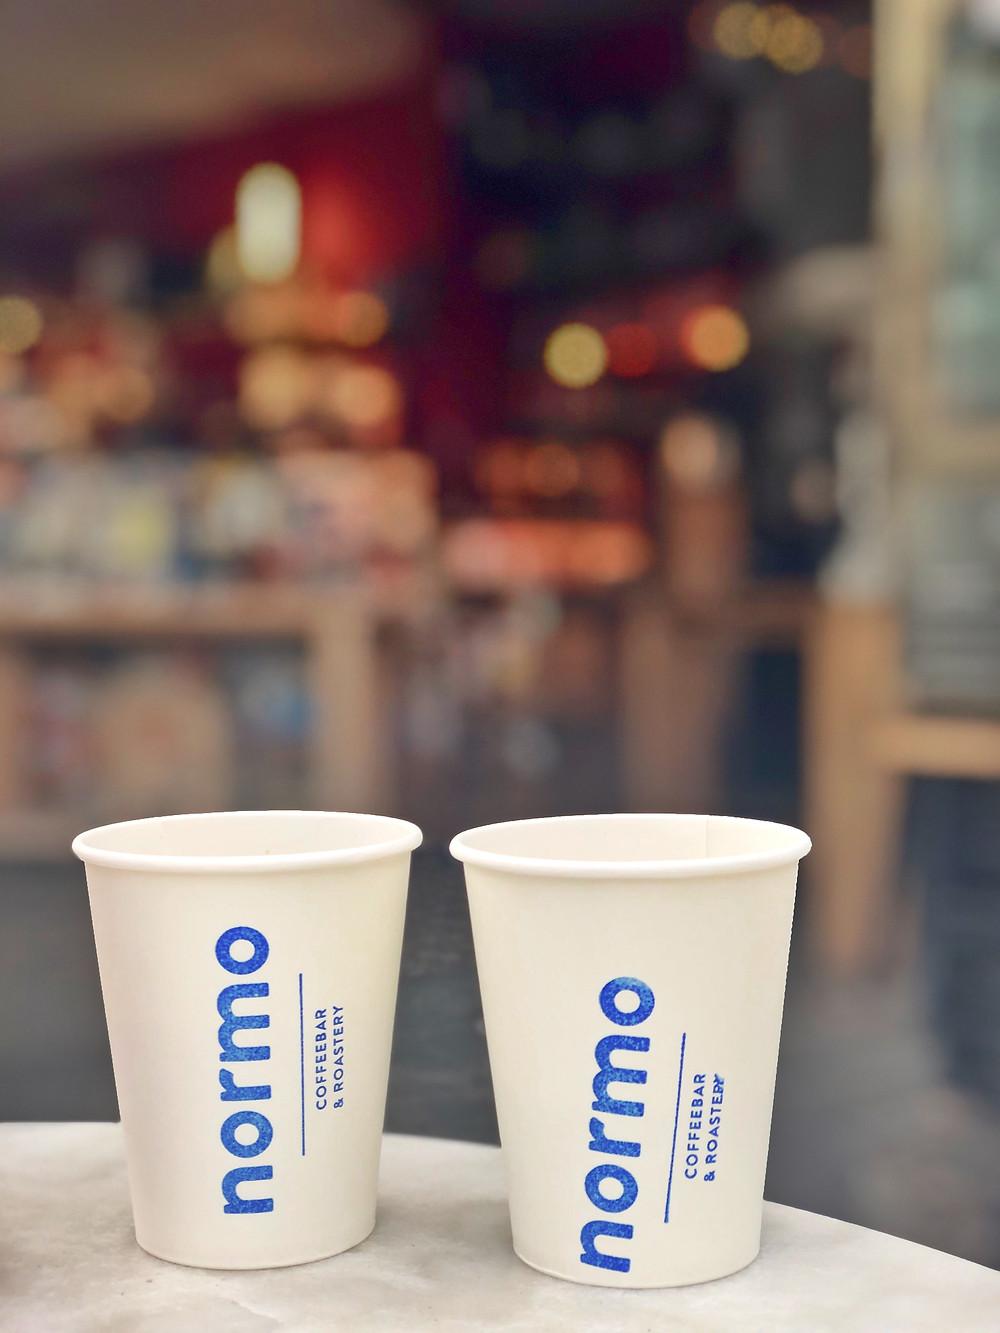 Normo coffee Antwerp